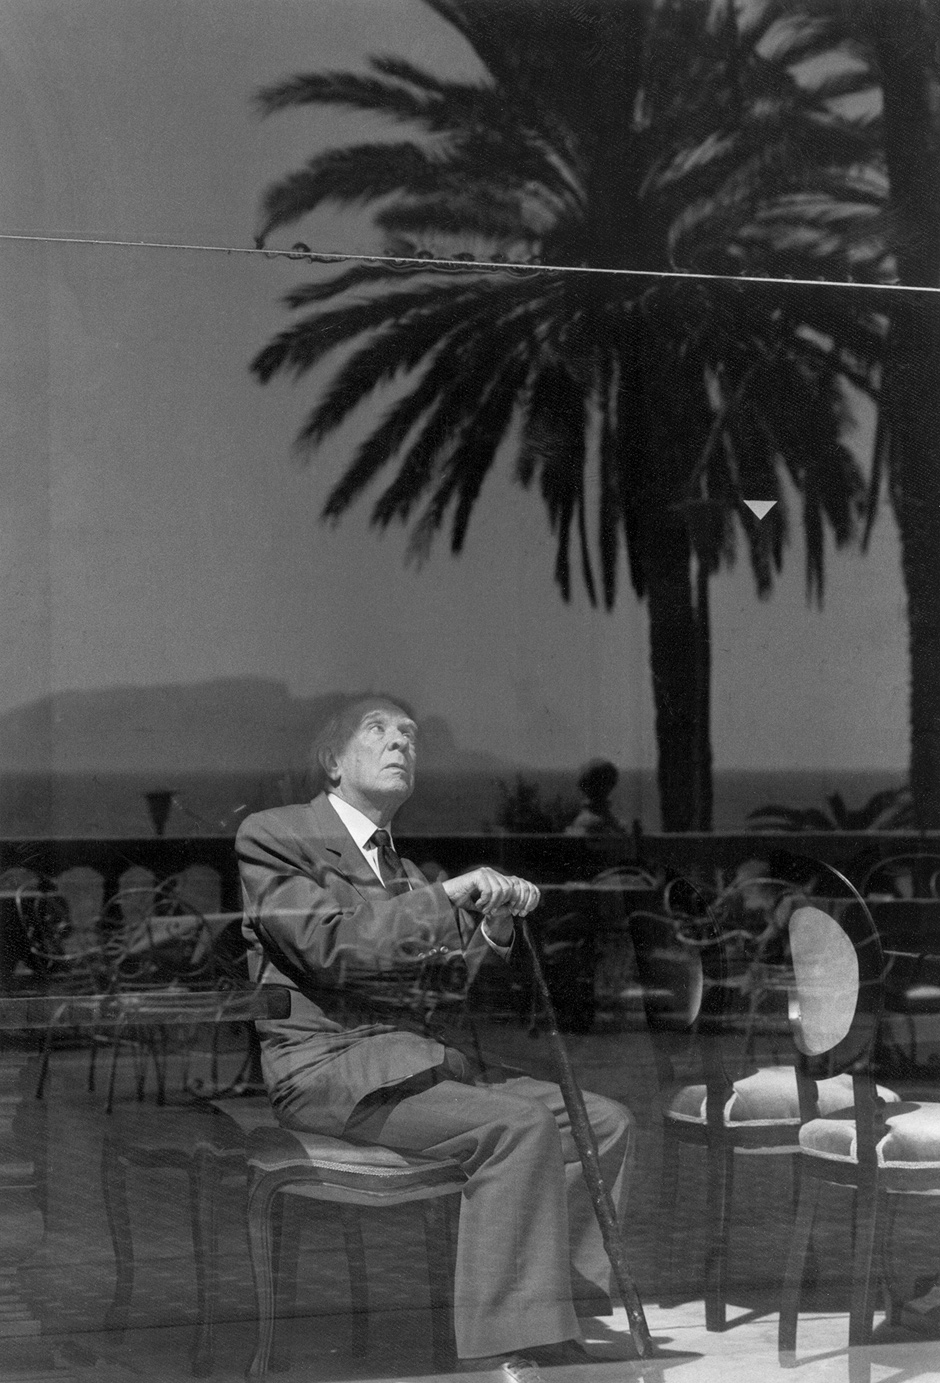 Jorge Luis Borges, Palermo, Sicily, 1984. Photo © Ferdinando Scianna/Magnum Photos